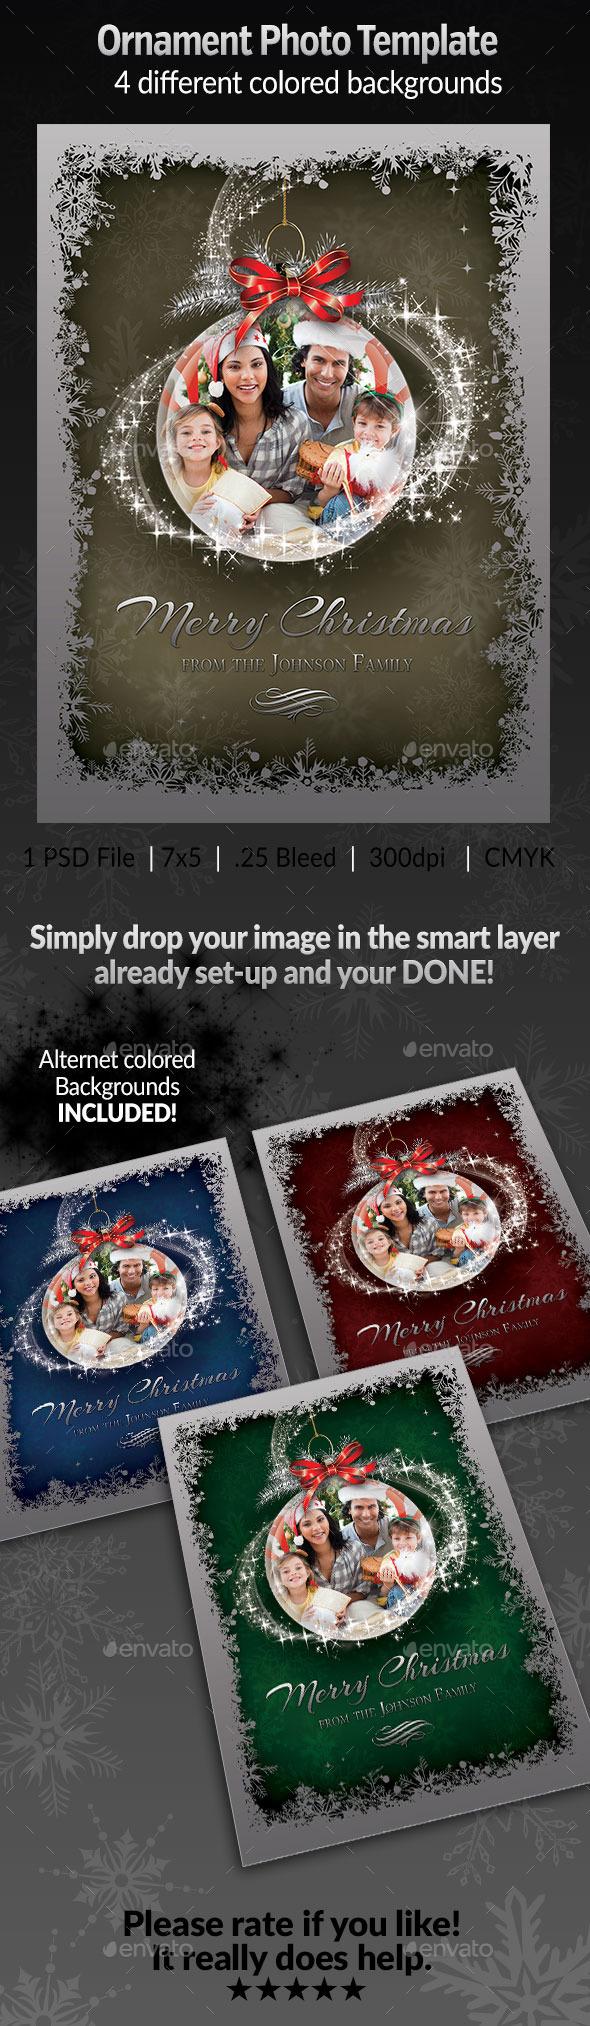 Ornament Photo Template - Seasonal Photo Templates